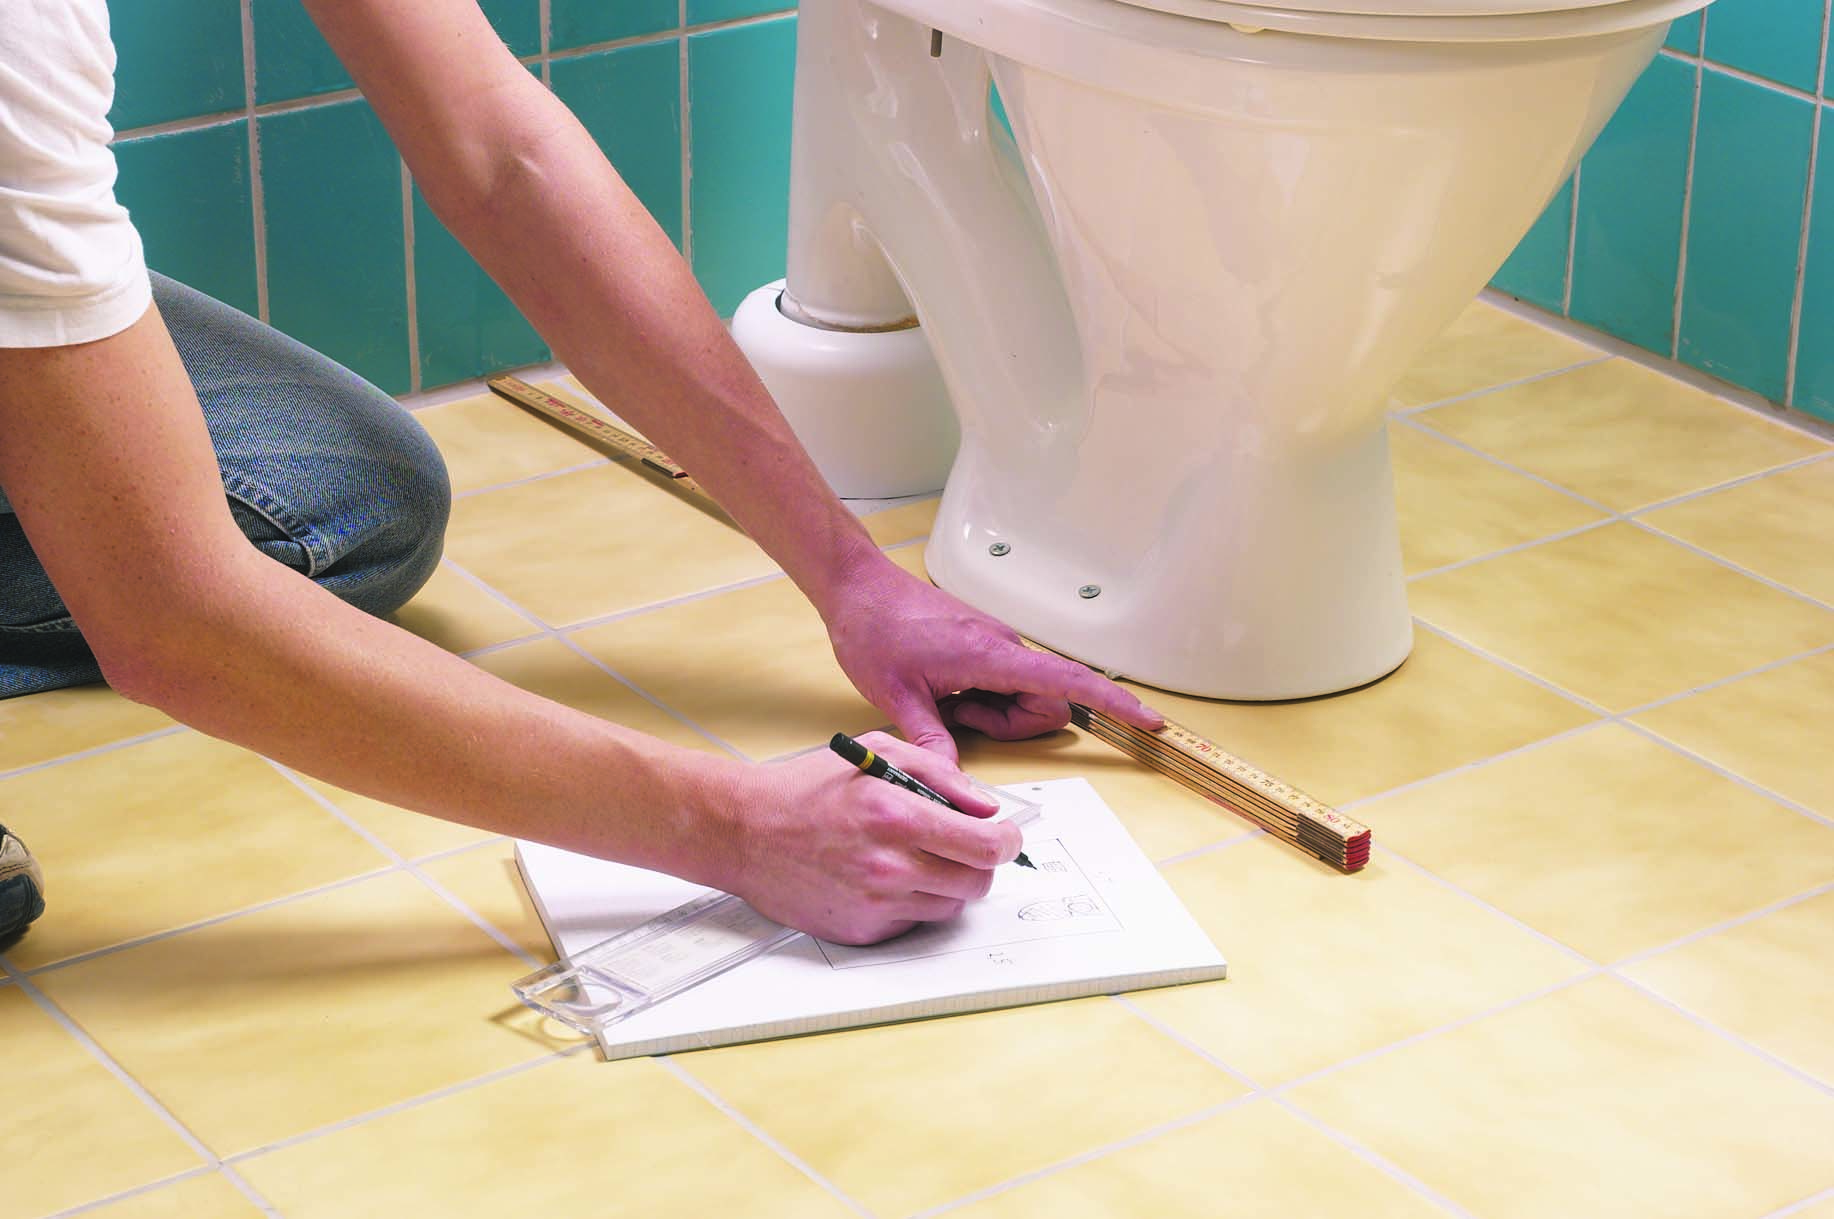 Монтаж сантехники в частном доме своими руками